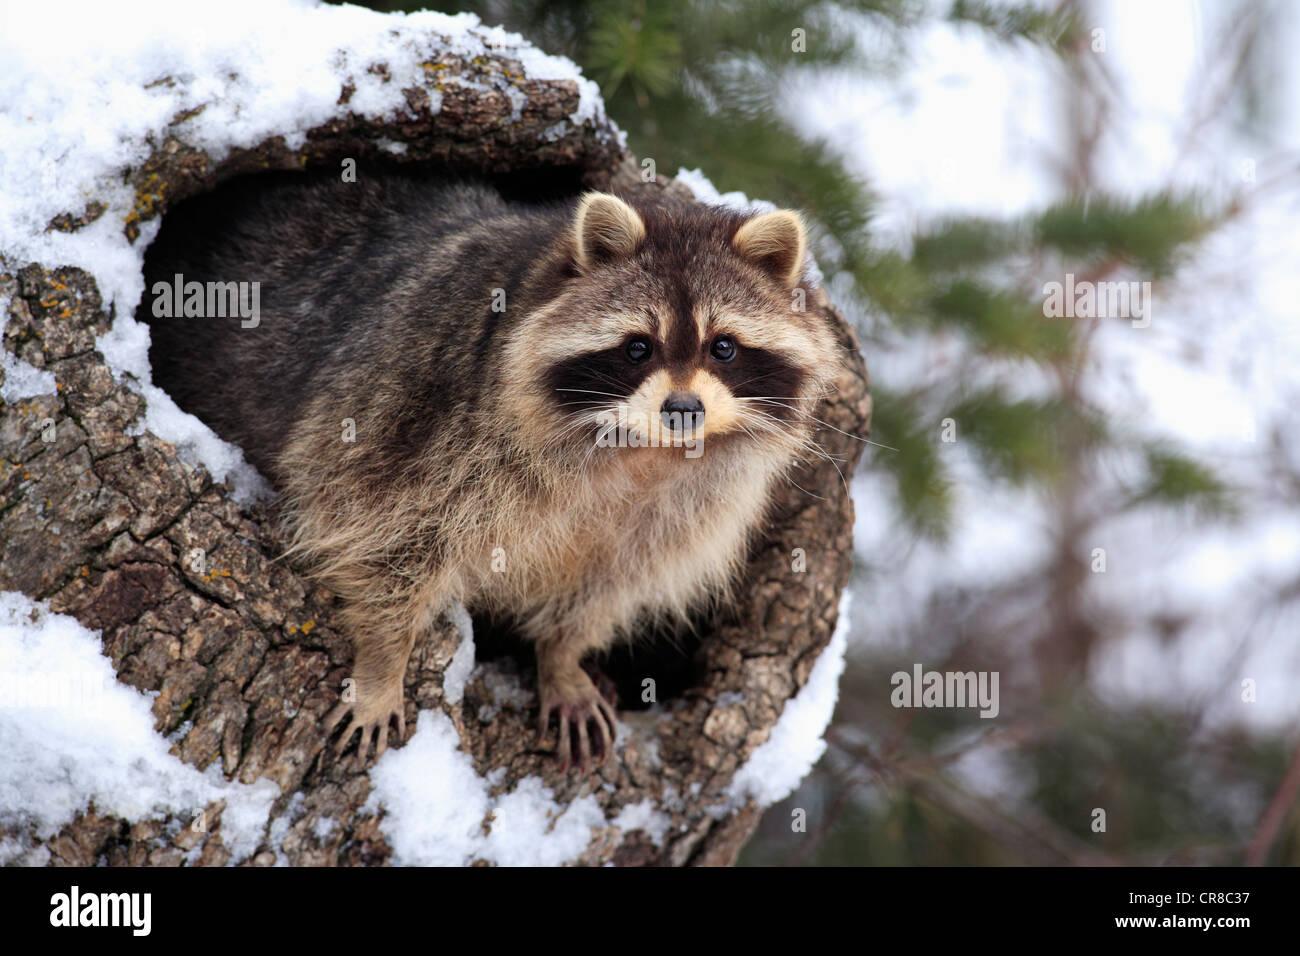 Le raton laveur (Procyon lotor), neige, den, Montana, USA Photo Stock